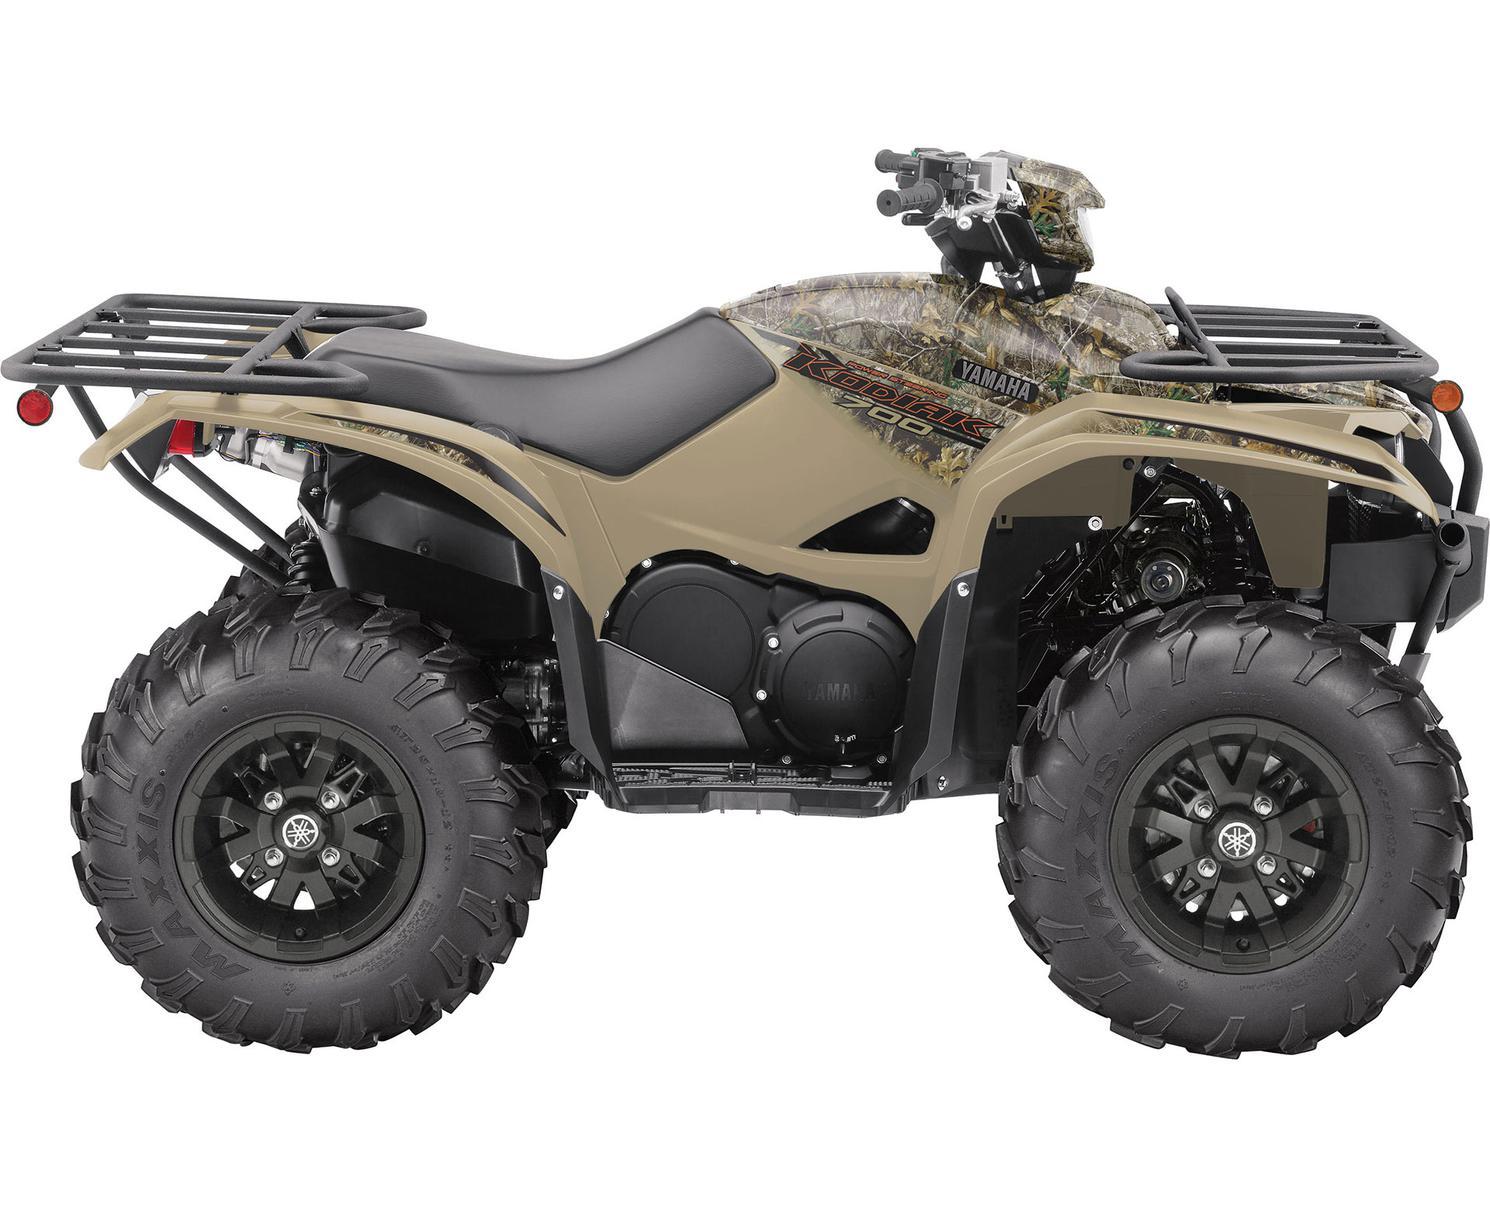 2021 Yamaha Kodiak 700 EPS Fall Beige With Realtree Edge